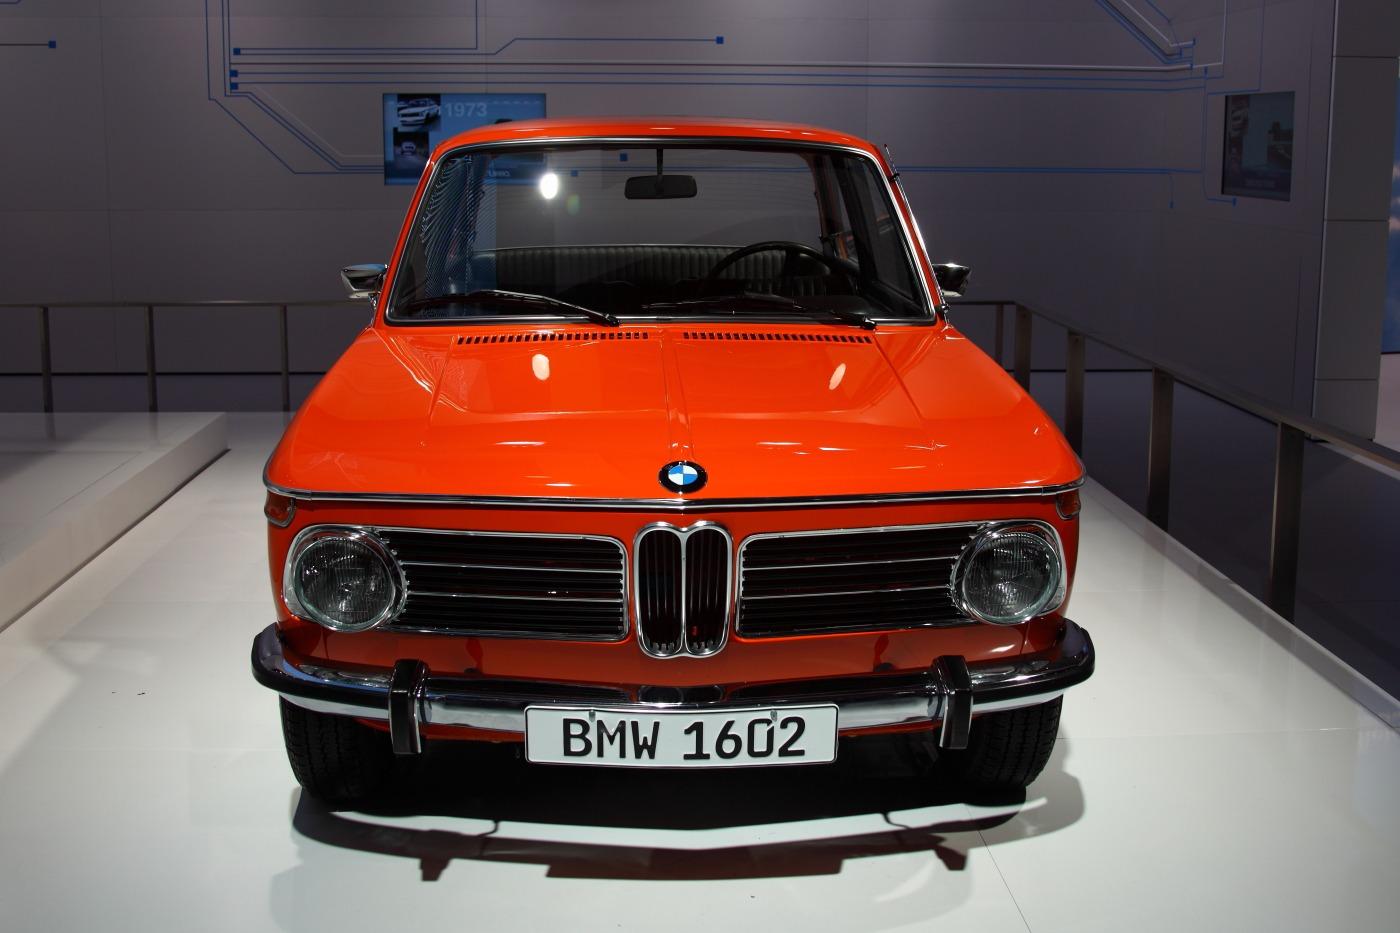 Bmw 1602 Electro Antrieb E10 1972 Old Concept Cars